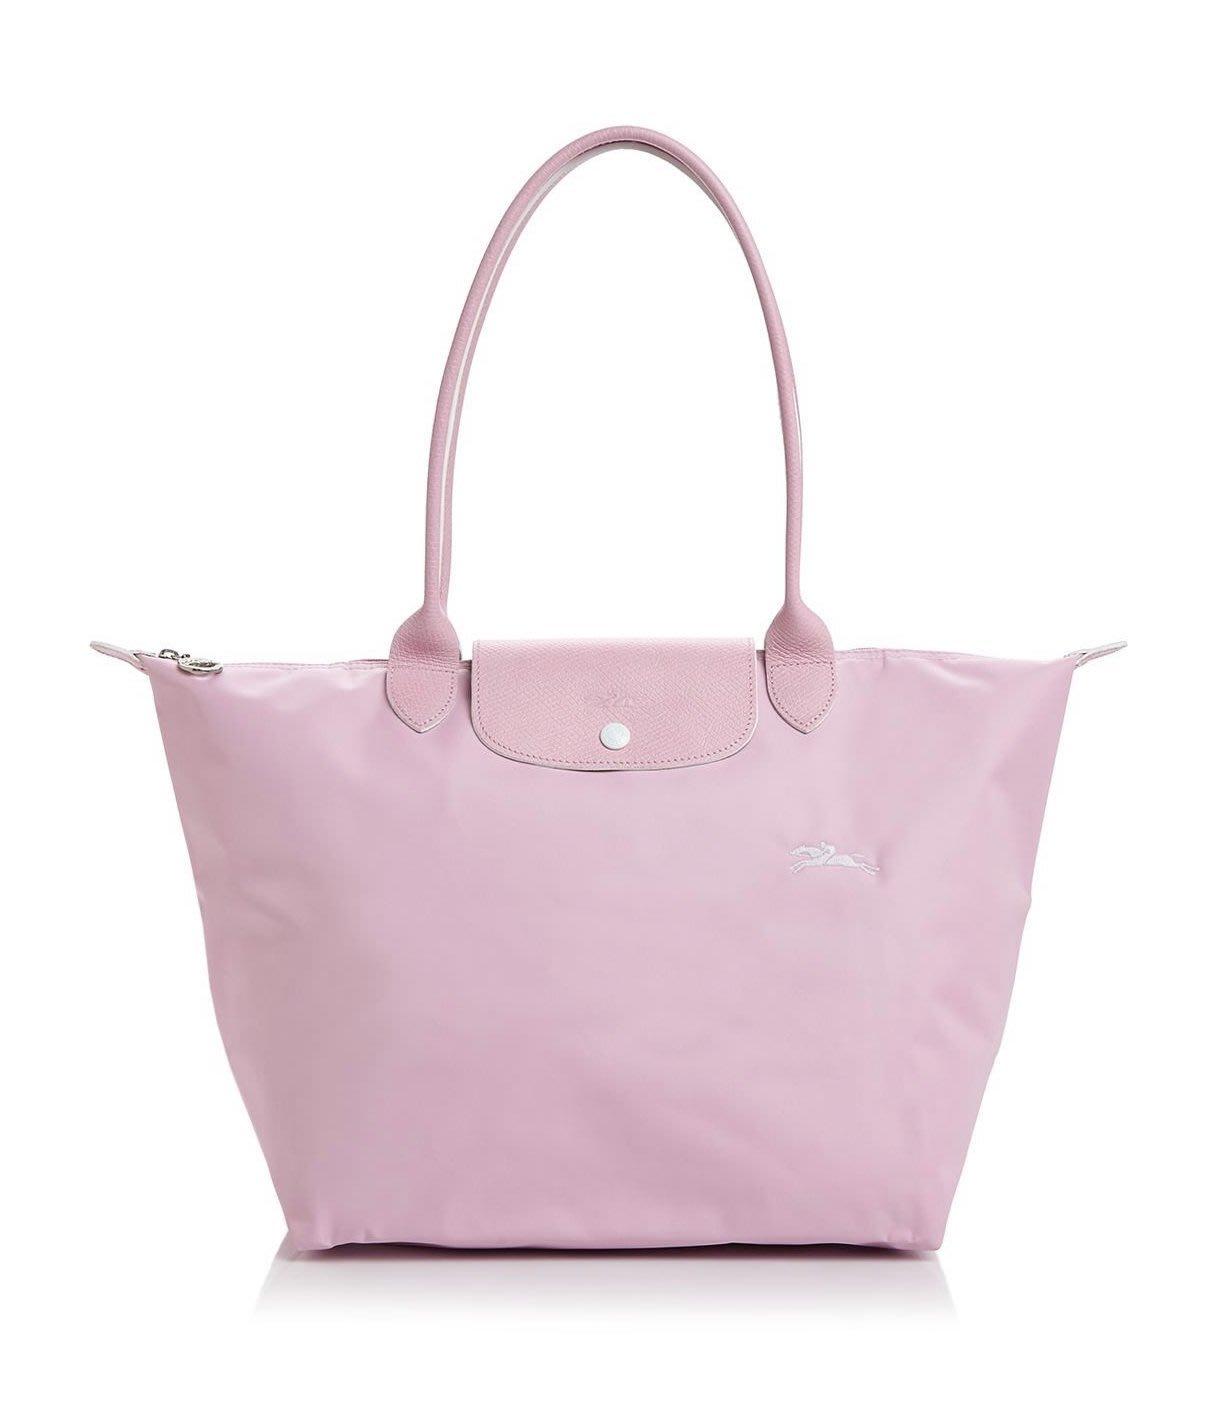 Coco小舖 Longchamp Le Pliage Club Large Shoulder Tote 大款粉紅色